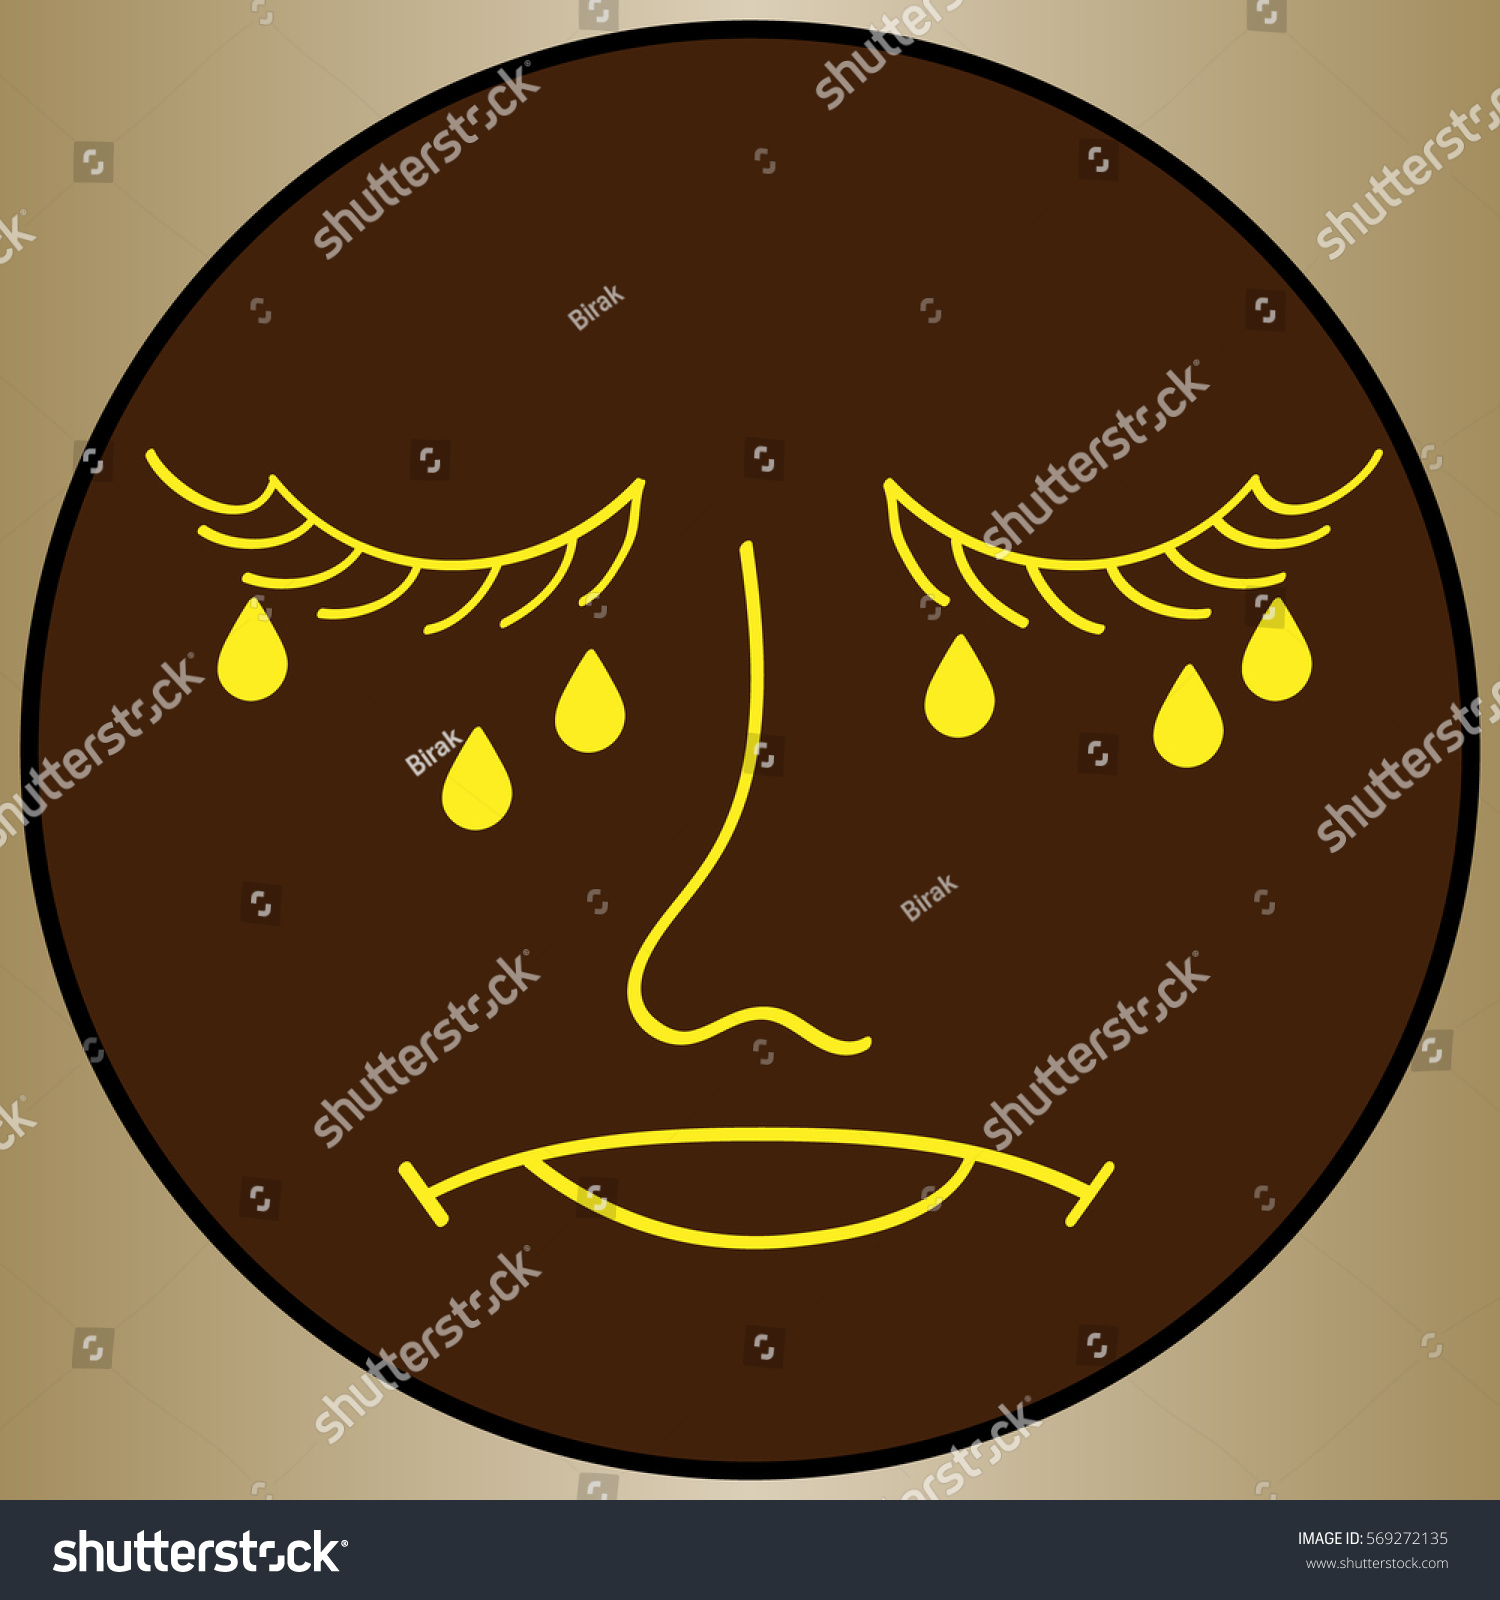 Sad face pics for facebook impremedia sad face facebook sad face symbol facebook new like set sad icon buycottarizona Gallery